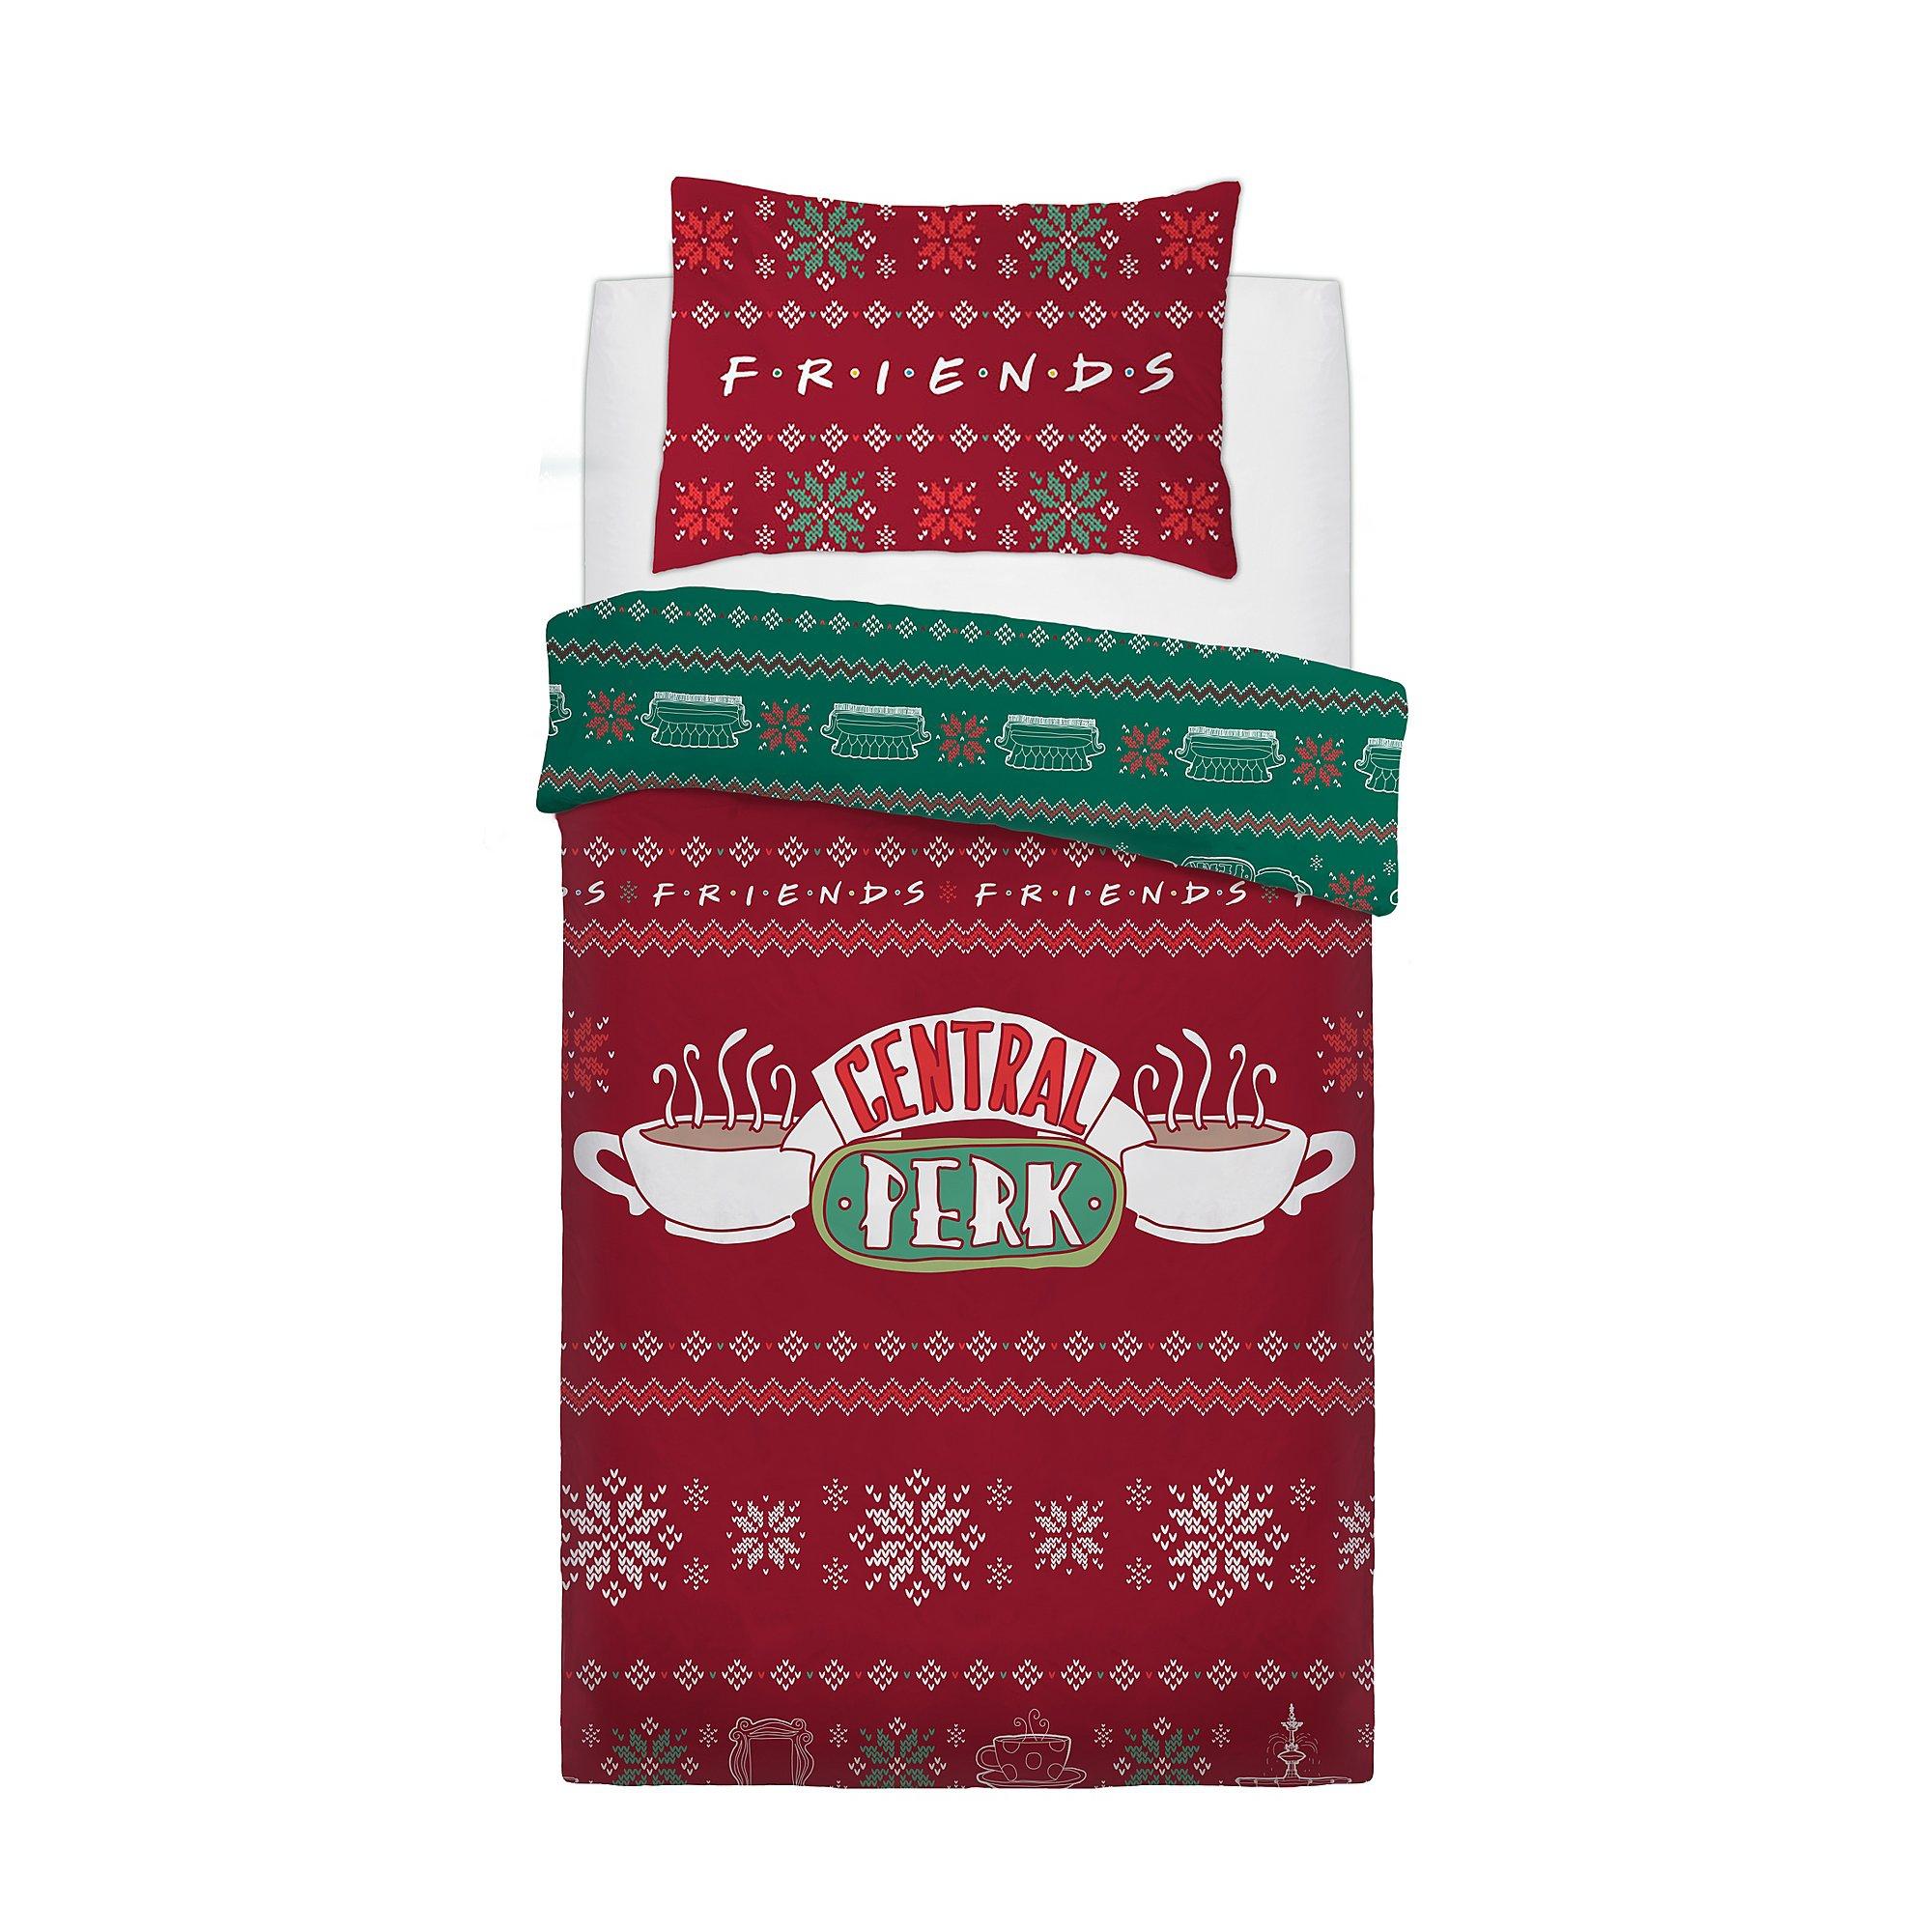 Friends Sweater Panel Single Bed Duvet Quilt Cover Set